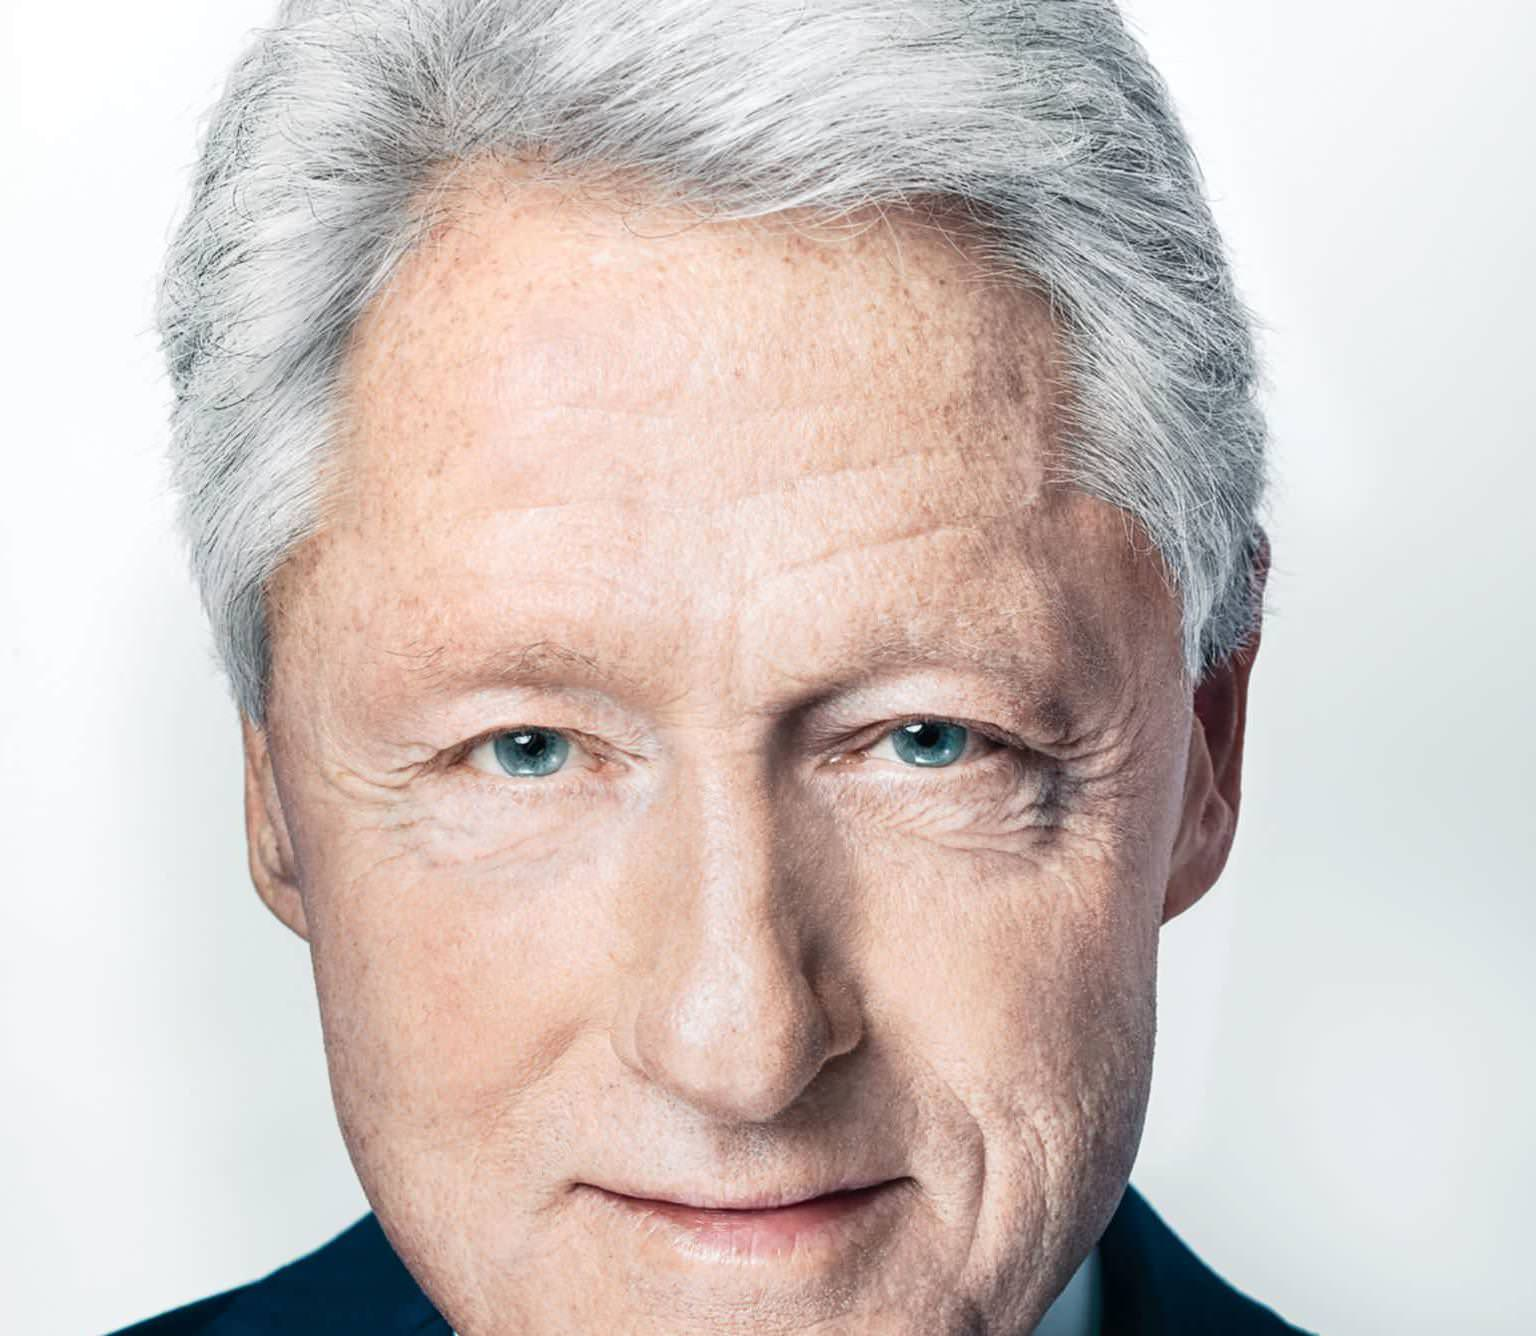 Bill Clinton On The Importance of Entrepreneurship